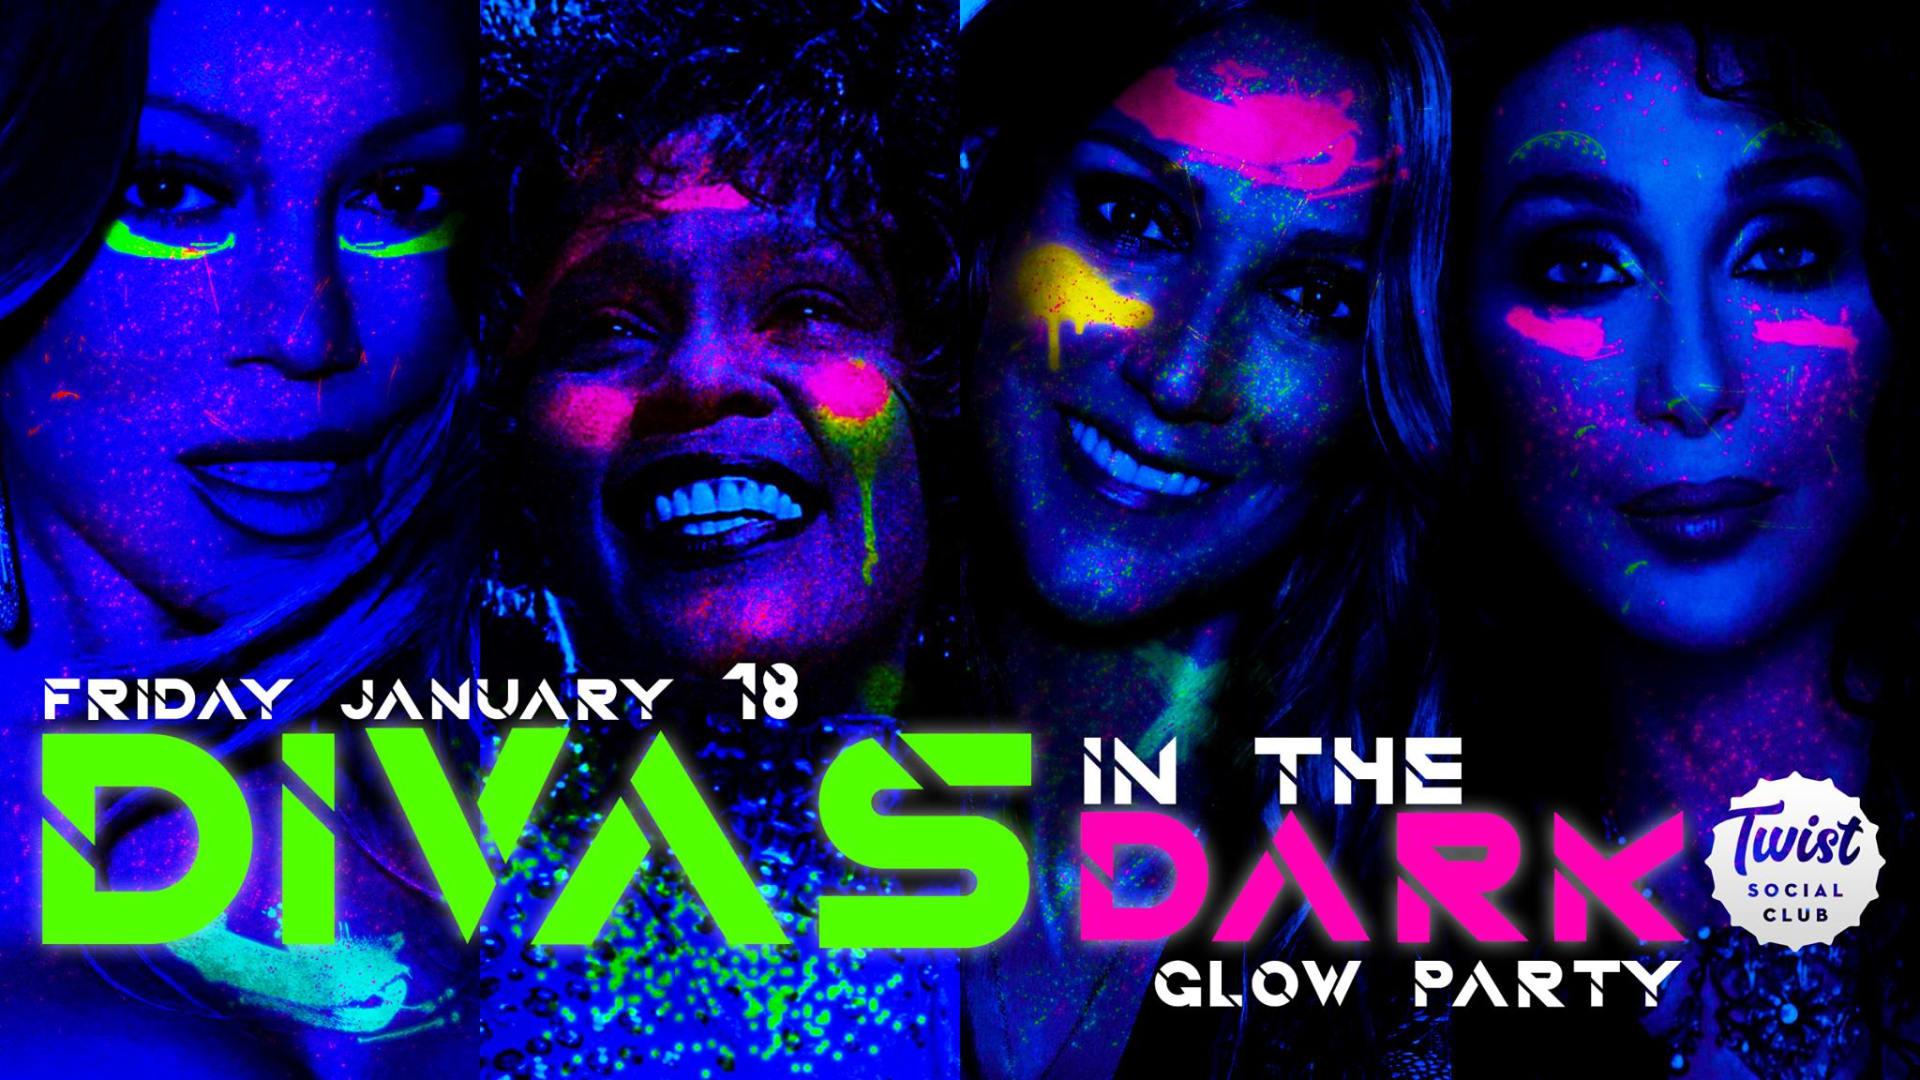 DIVAS in the DARK Glow Party